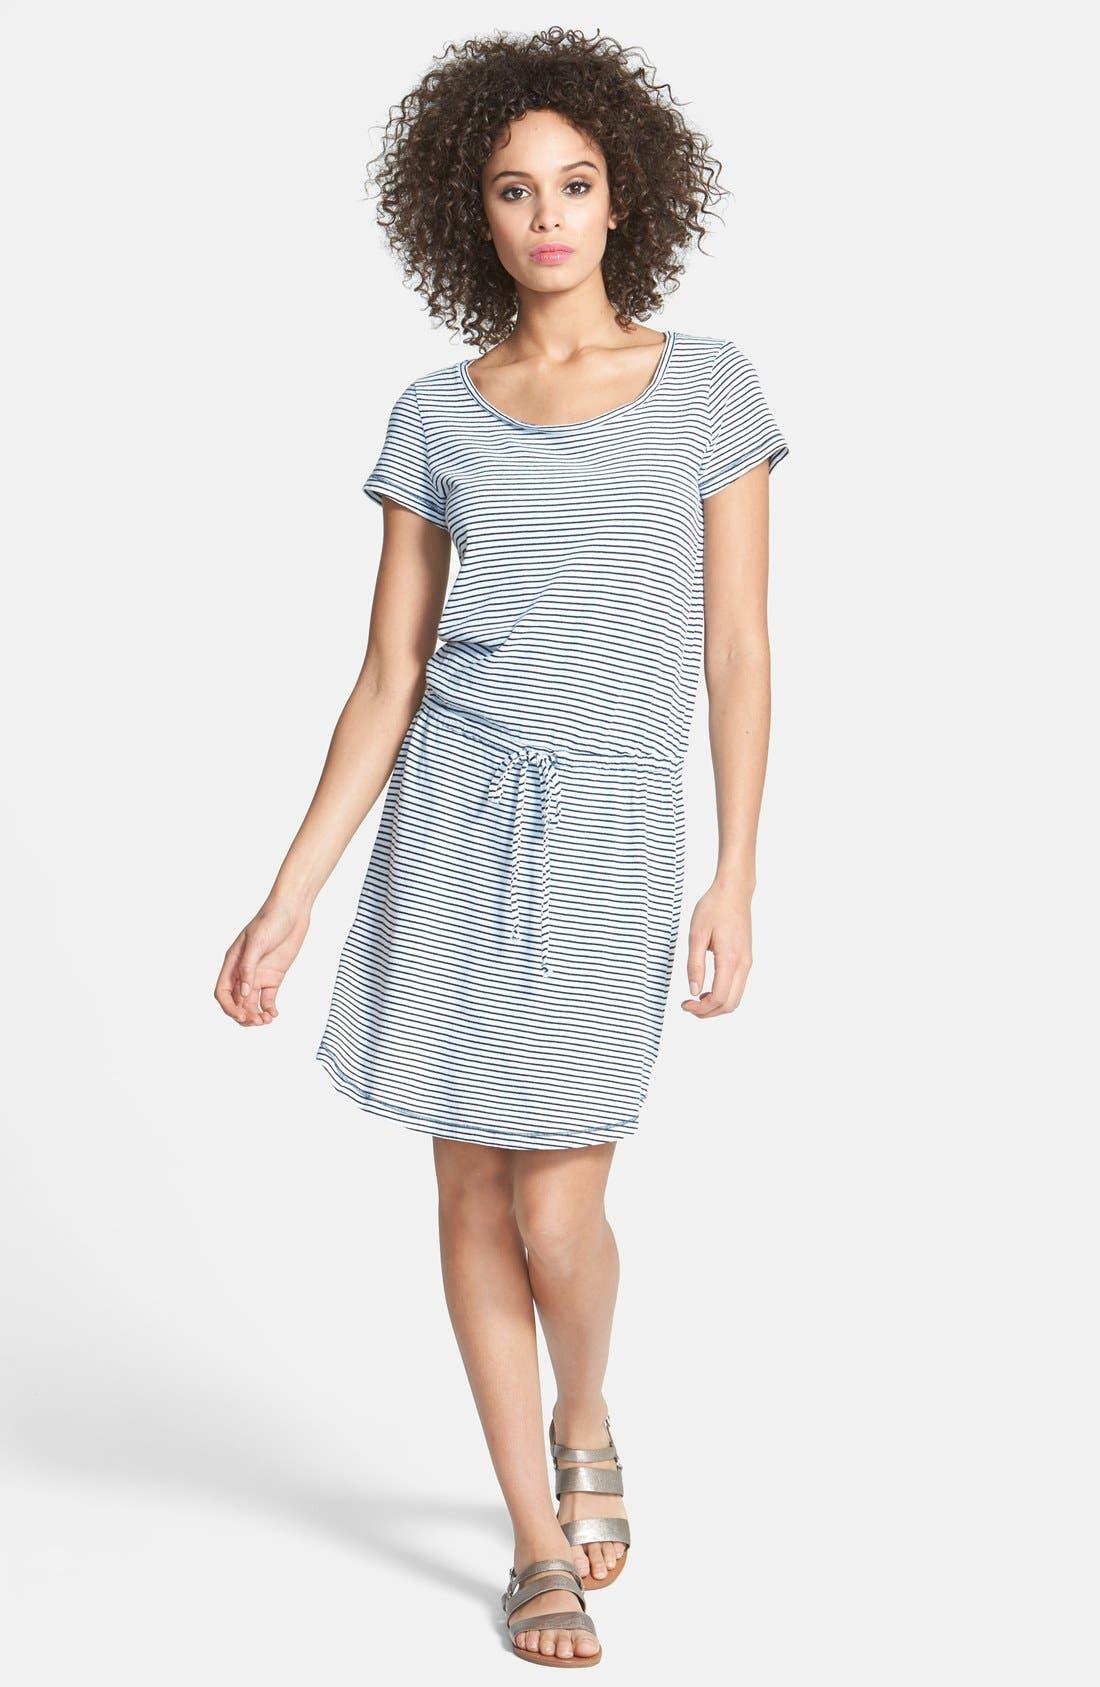 Alternate Image 1 Selected - Splendid Indigo Dye Stripe Knit Blouson Dress